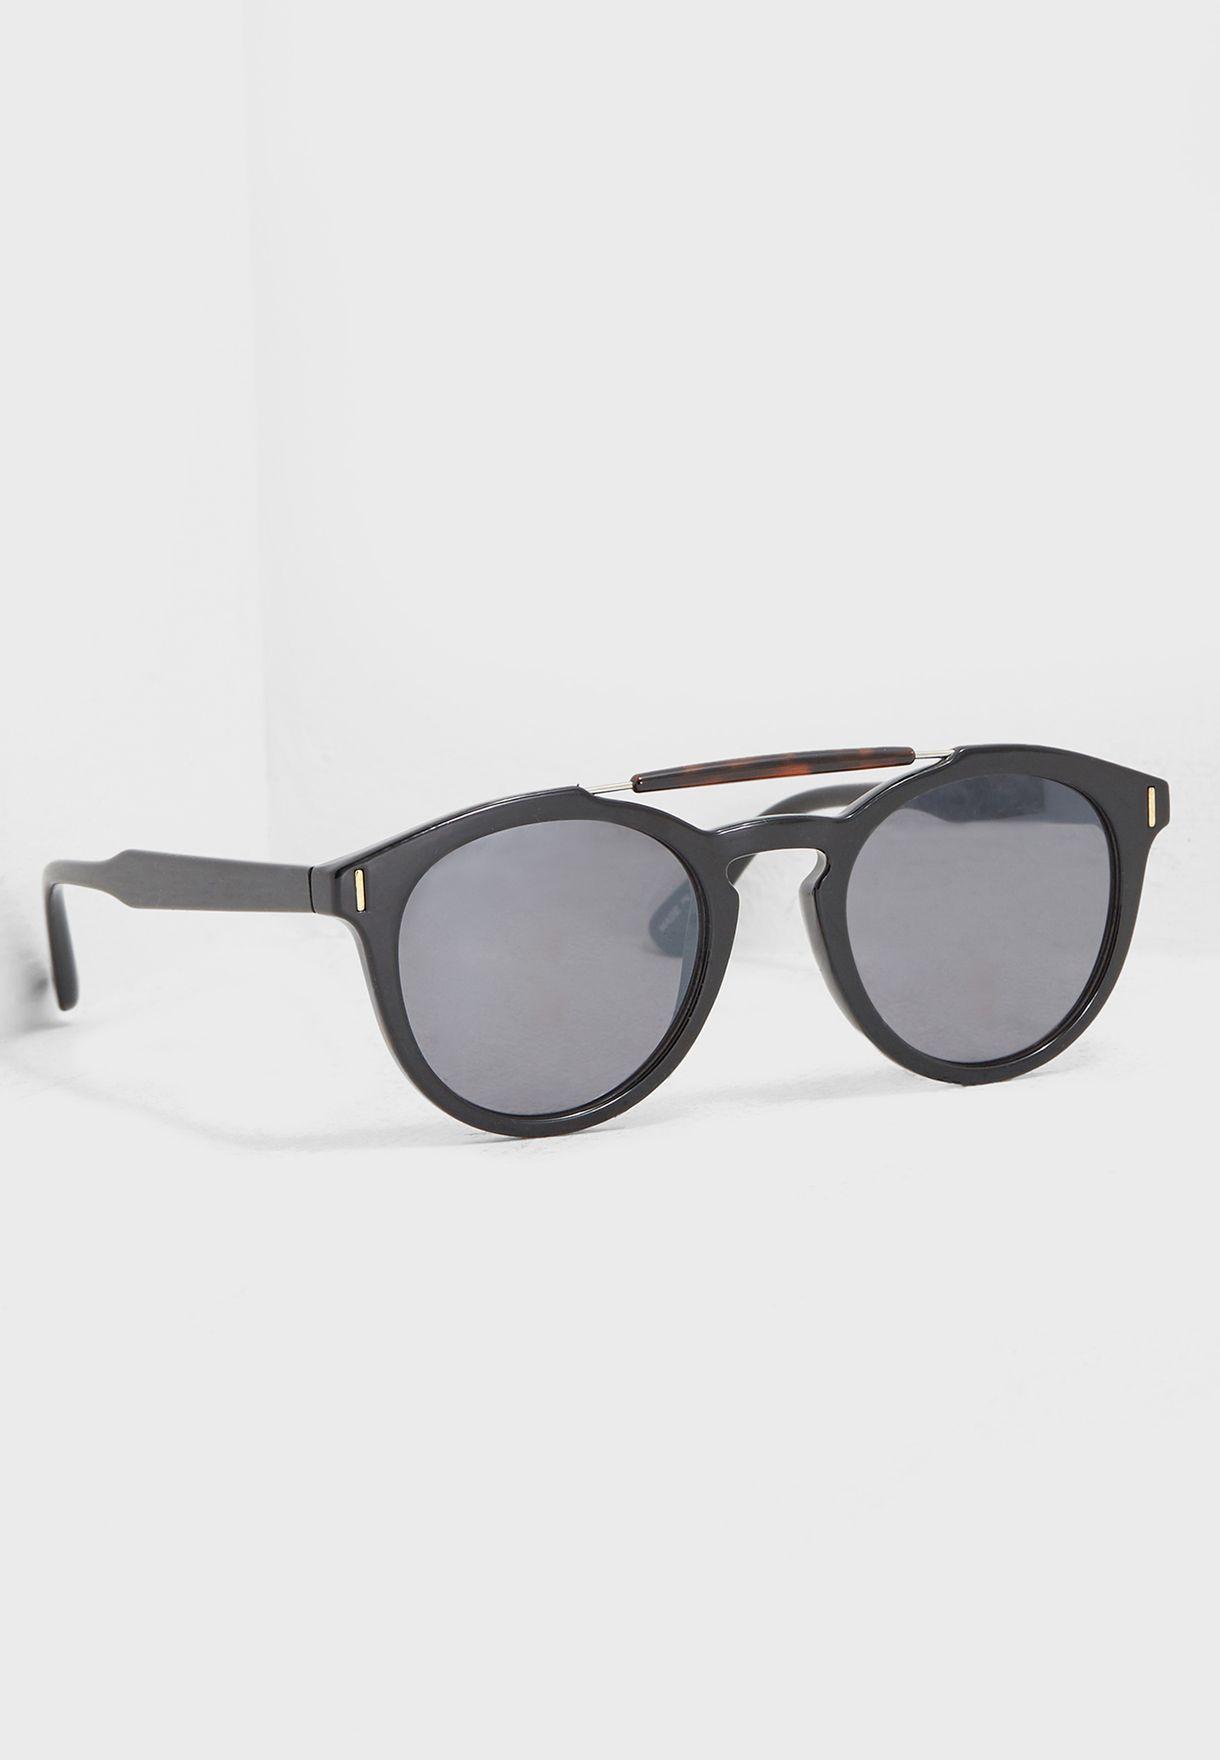 a9954eae42 Shop Aldo black Zeillan Sunglasses ZEILLAN98 for Men in UAE ...